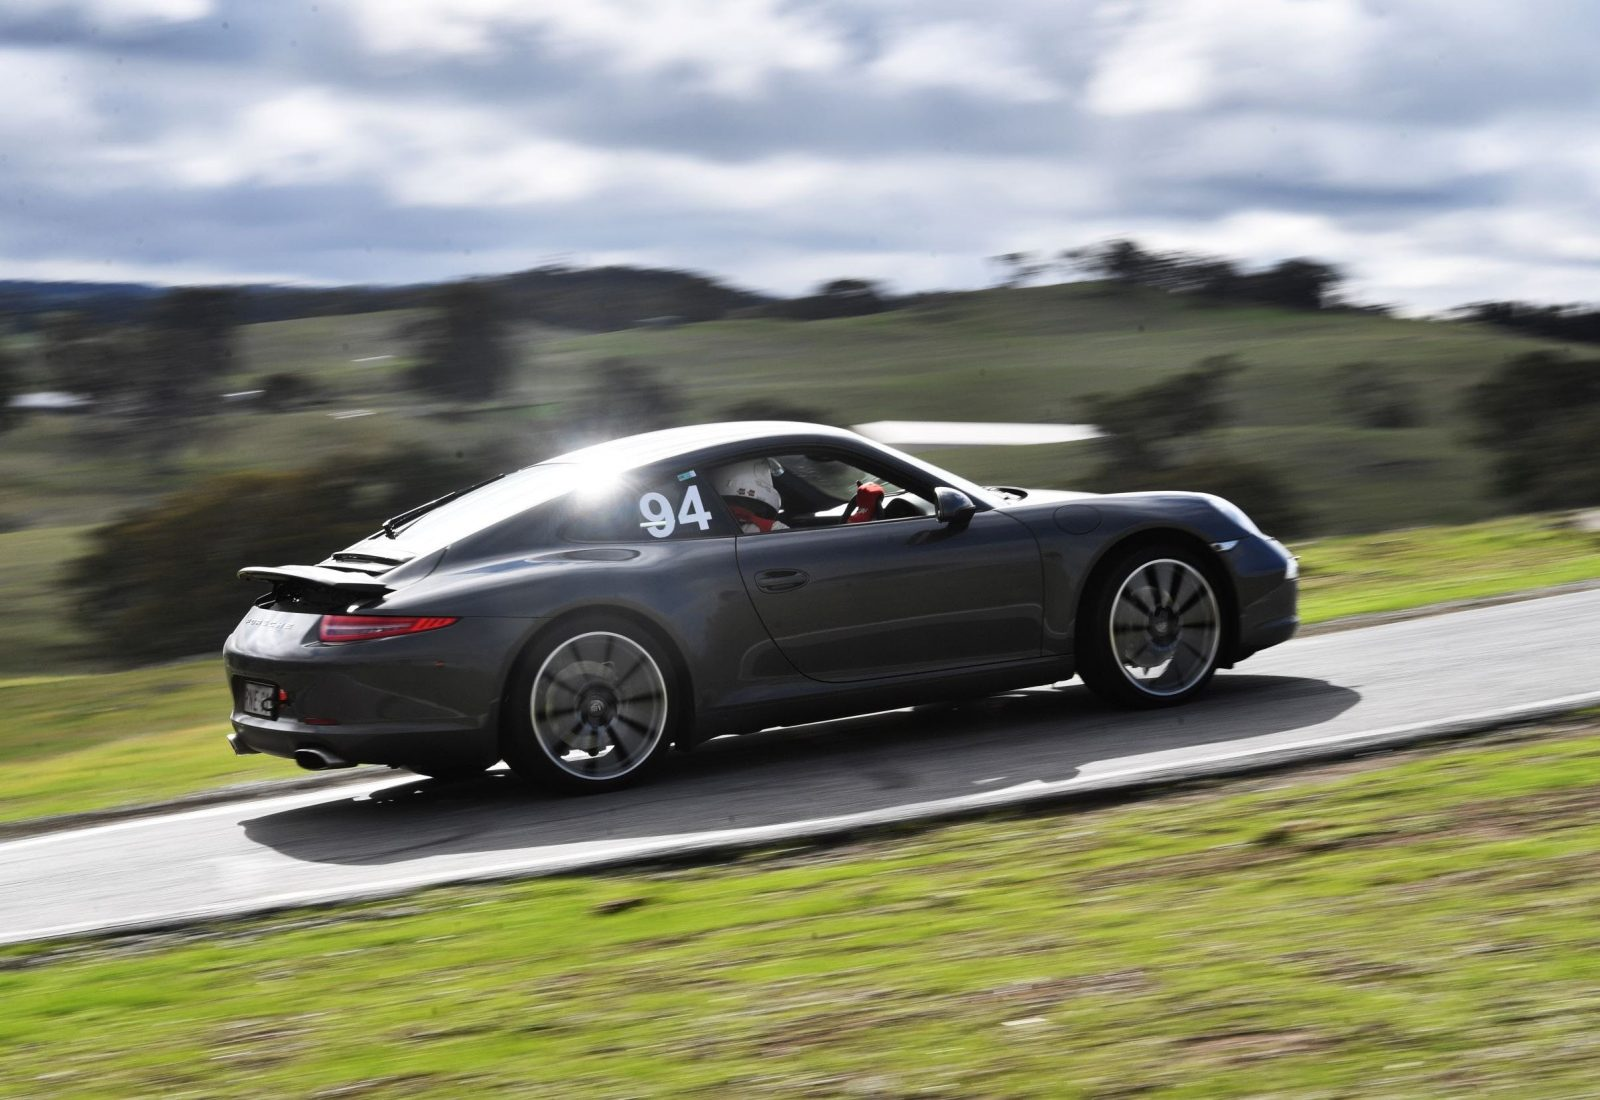 Porsche at Collingrove Hillclimb